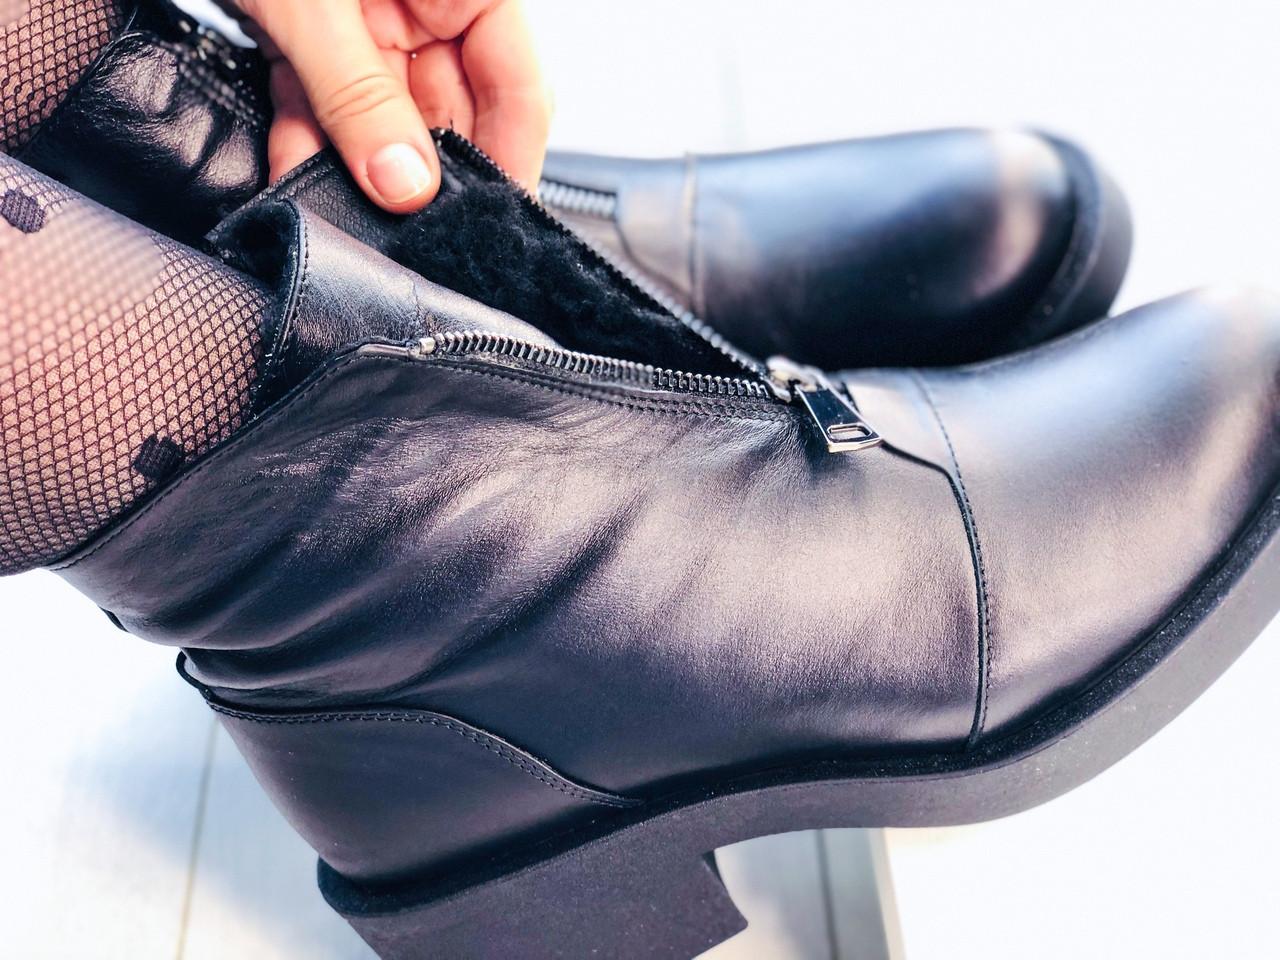 Женские зимние ботинки на молнии впереди